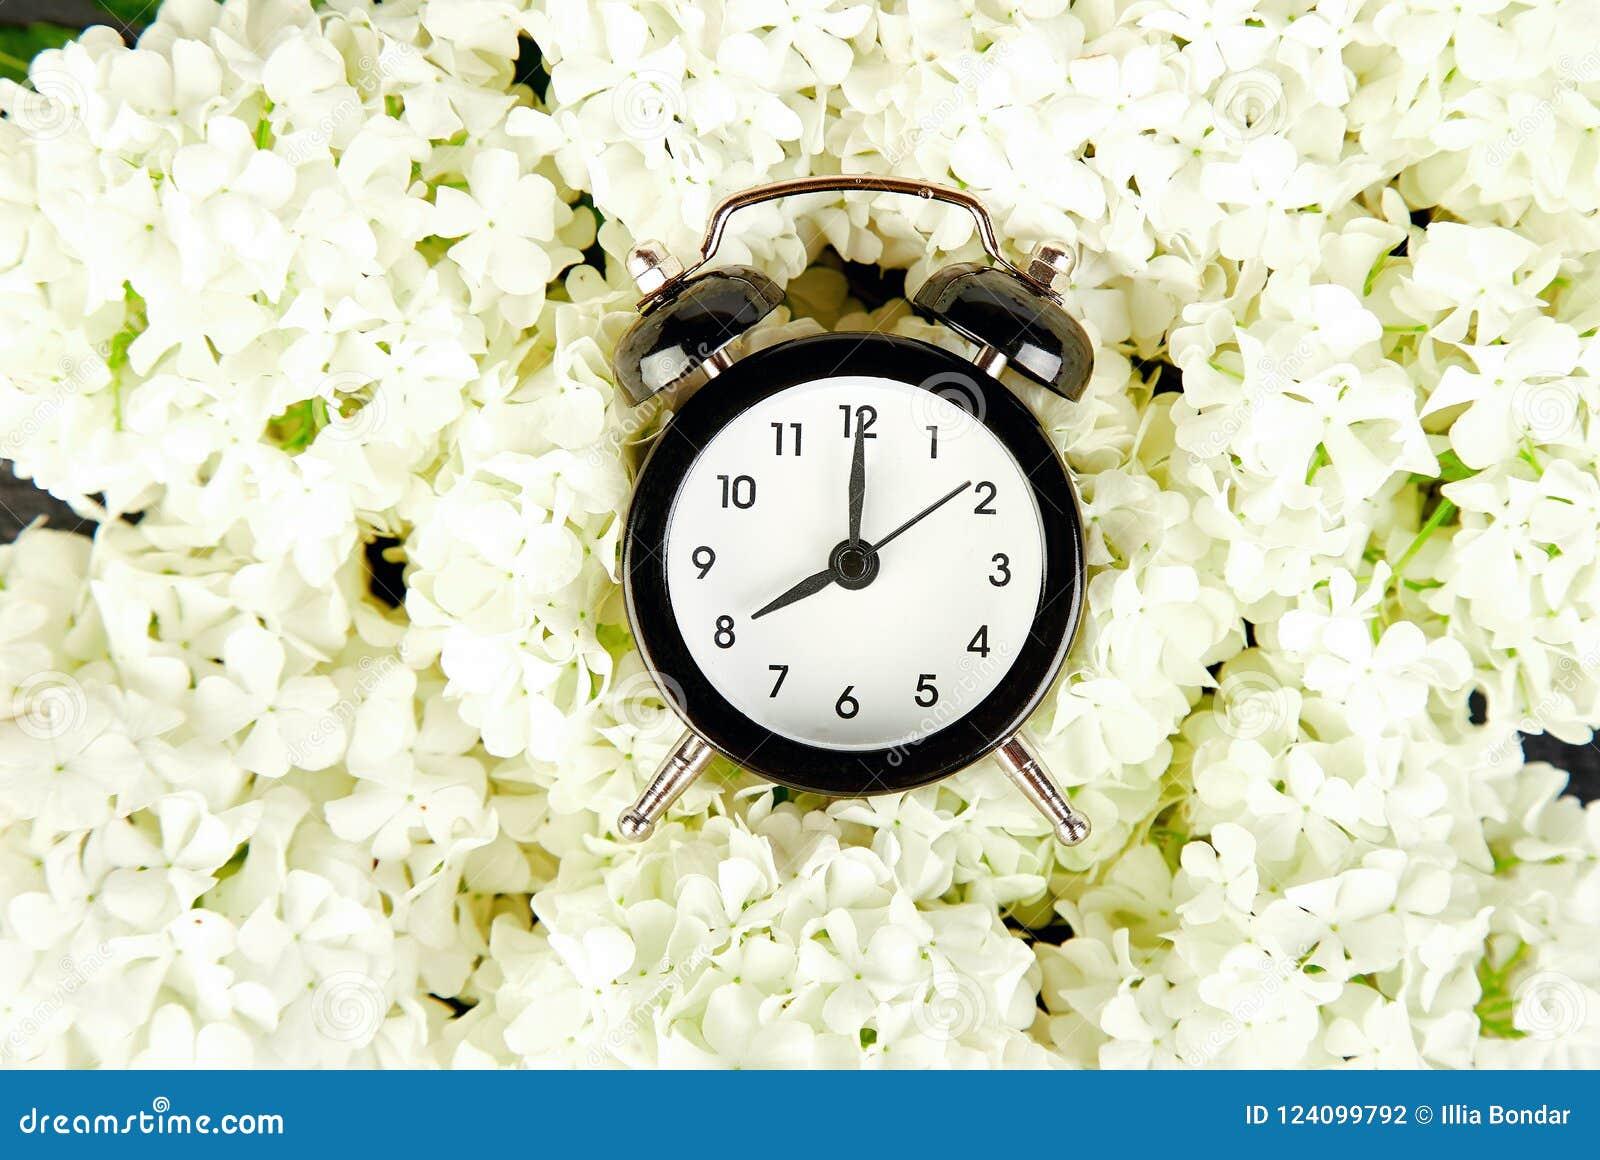 Black Alarm Clock And White Flowers On Black Background Stock Photo